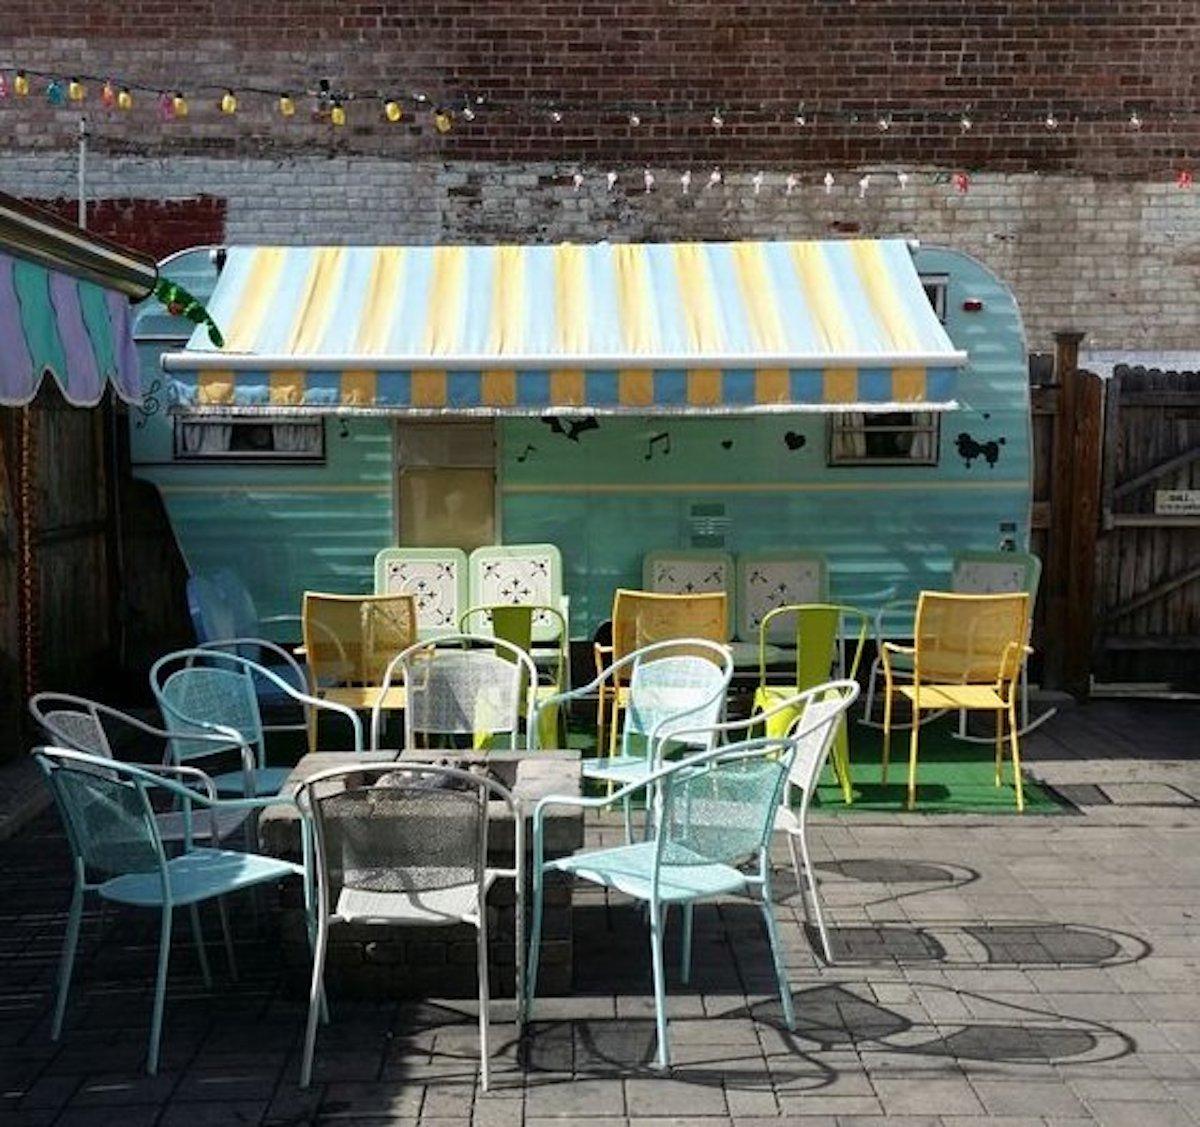 Ogie's Trailer Park, the best outdoor bar in Rhode Island